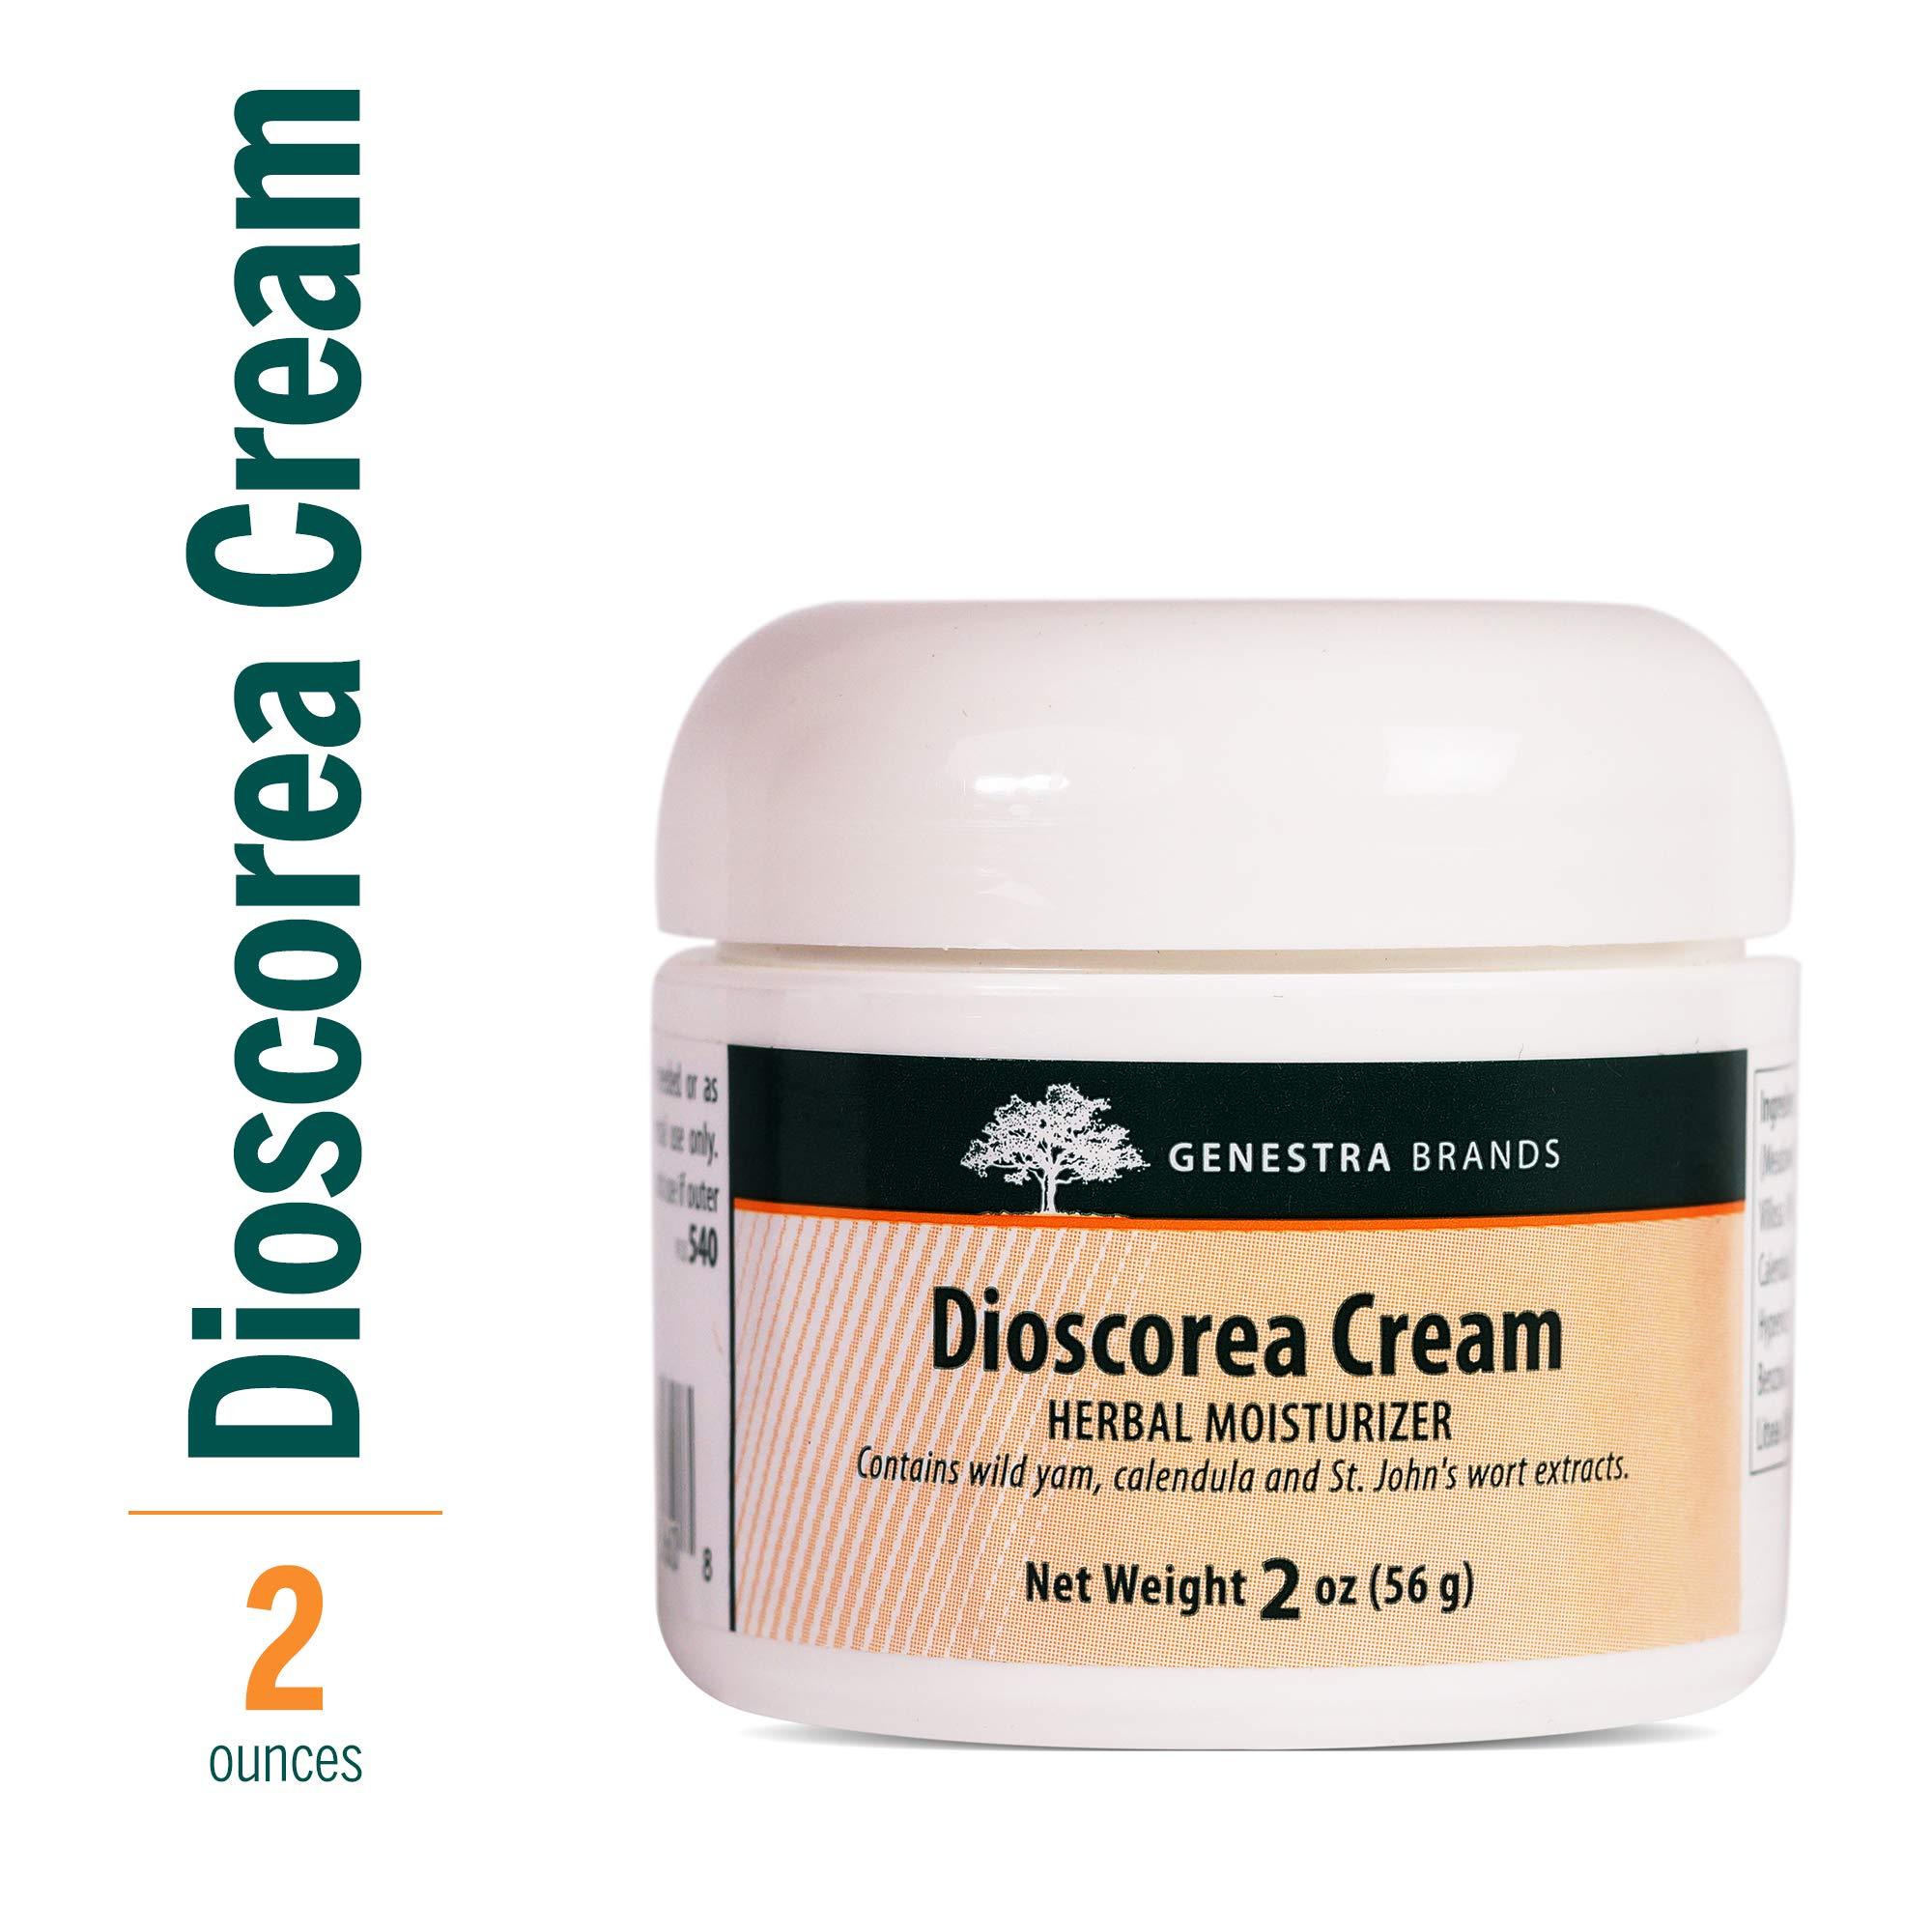 Genestra Brands - Dioscorea Cream - Herbal Moisturizer with Wild Yam, Calendula and St. John's Wort Extracts - 2 oz (56 g)